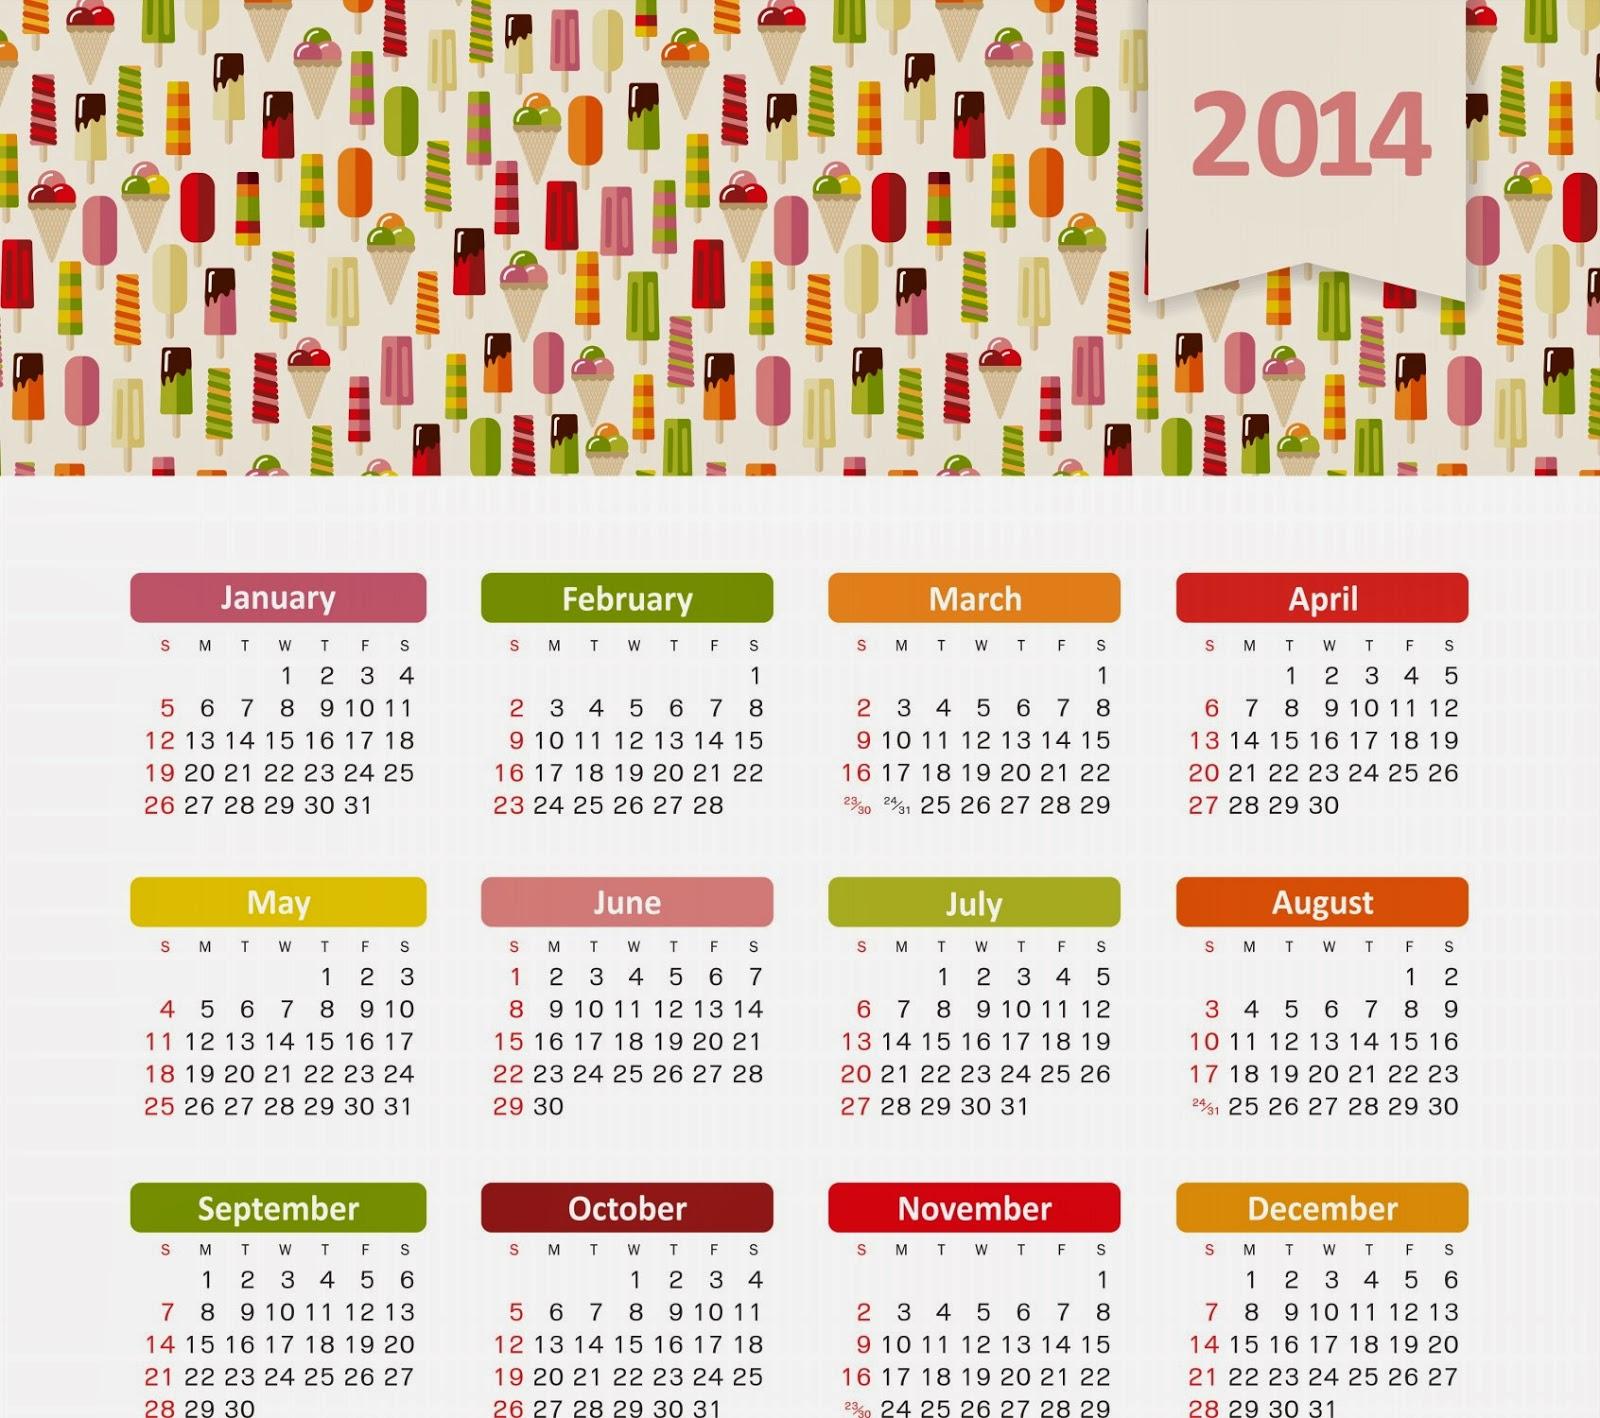 Calendar Design Elegant : Simple and elegant hd design of happy new year calendar